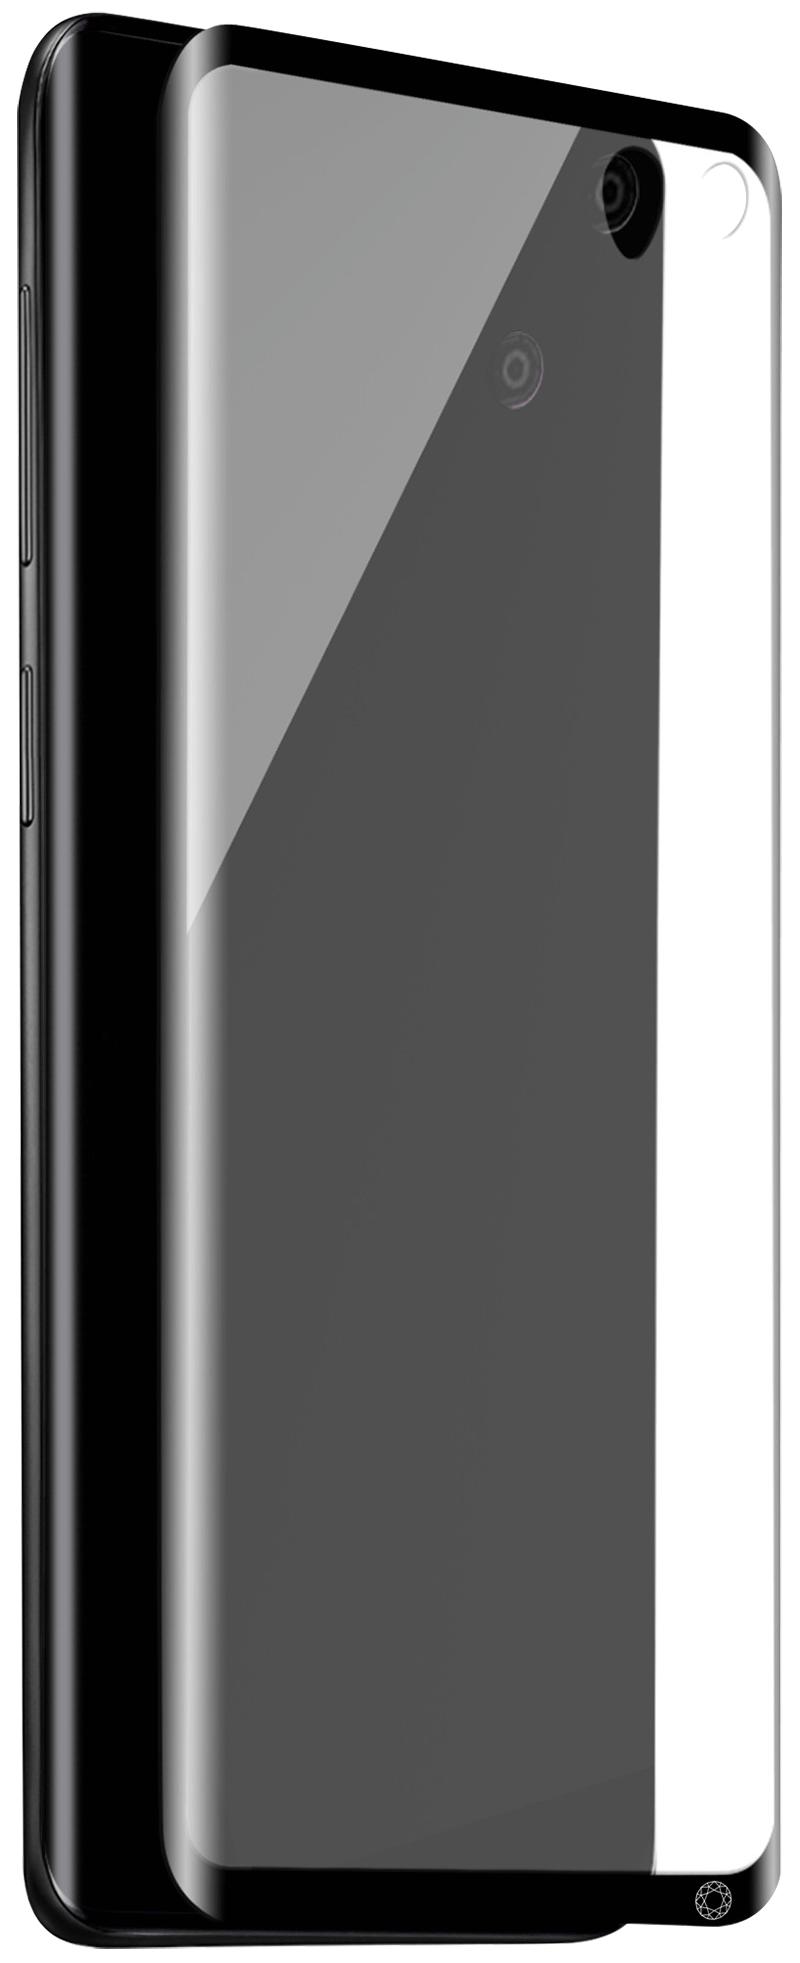 Film Force Glass Evo2 Galaxy S10 transparente